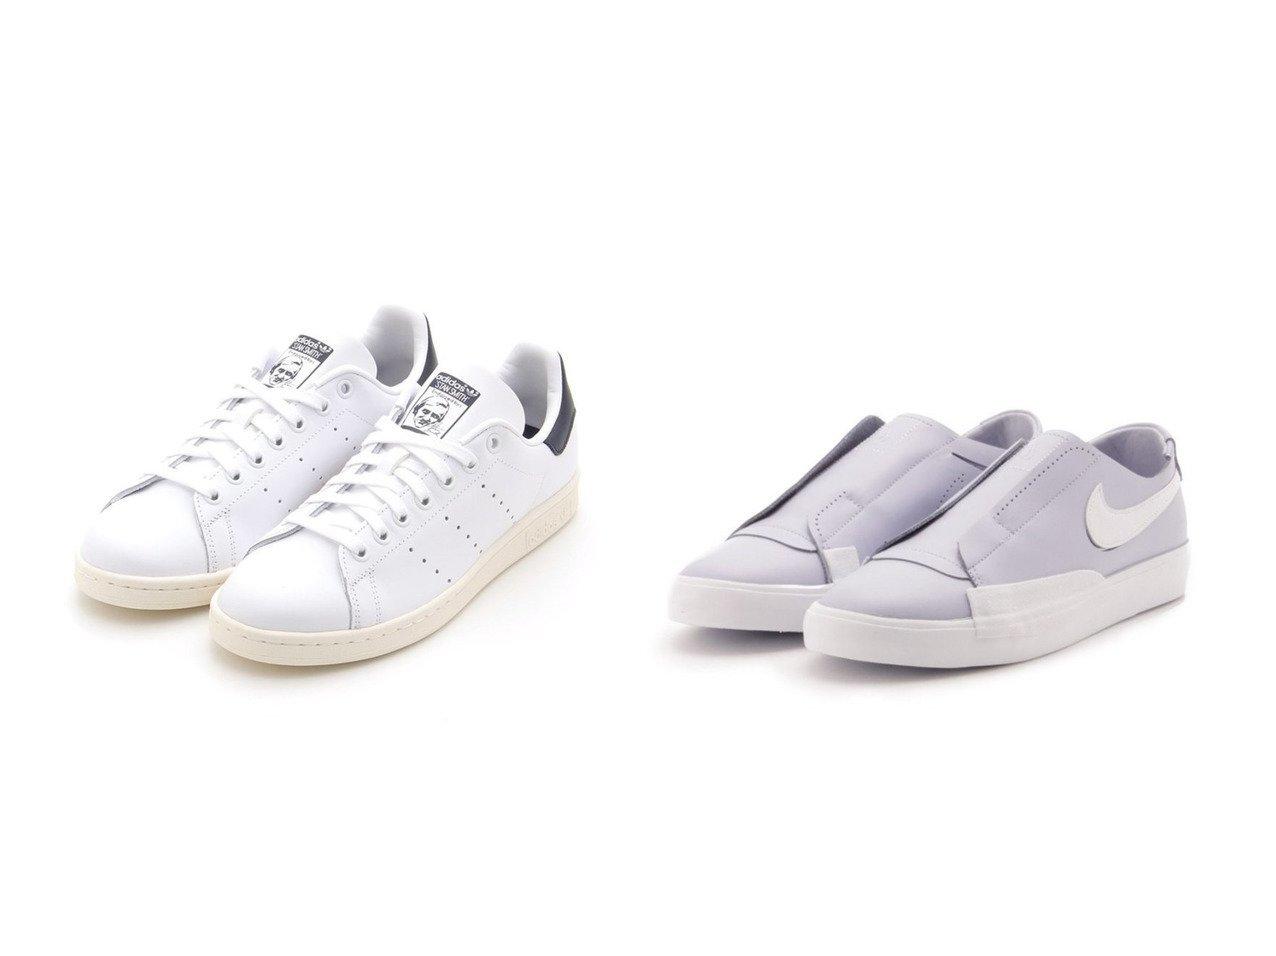 【emmi/エミ】の【adidas Originals】STAN SMITH&【NIKE】BLAZER SLIP シューズ・靴のおすすめ!人気、トレンド・レディースファッションの通販  おすすめで人気の流行・トレンド、ファッションの通販商品 メンズファッション・キッズファッション・インテリア・家具・レディースファッション・服の通販 founy(ファニー) https://founy.com/ ファッション Fashion レディースファッション WOMEN シューズ スニーカー スリッポン プレミアム インソール クッション シンプル  ID:crp329100000009840